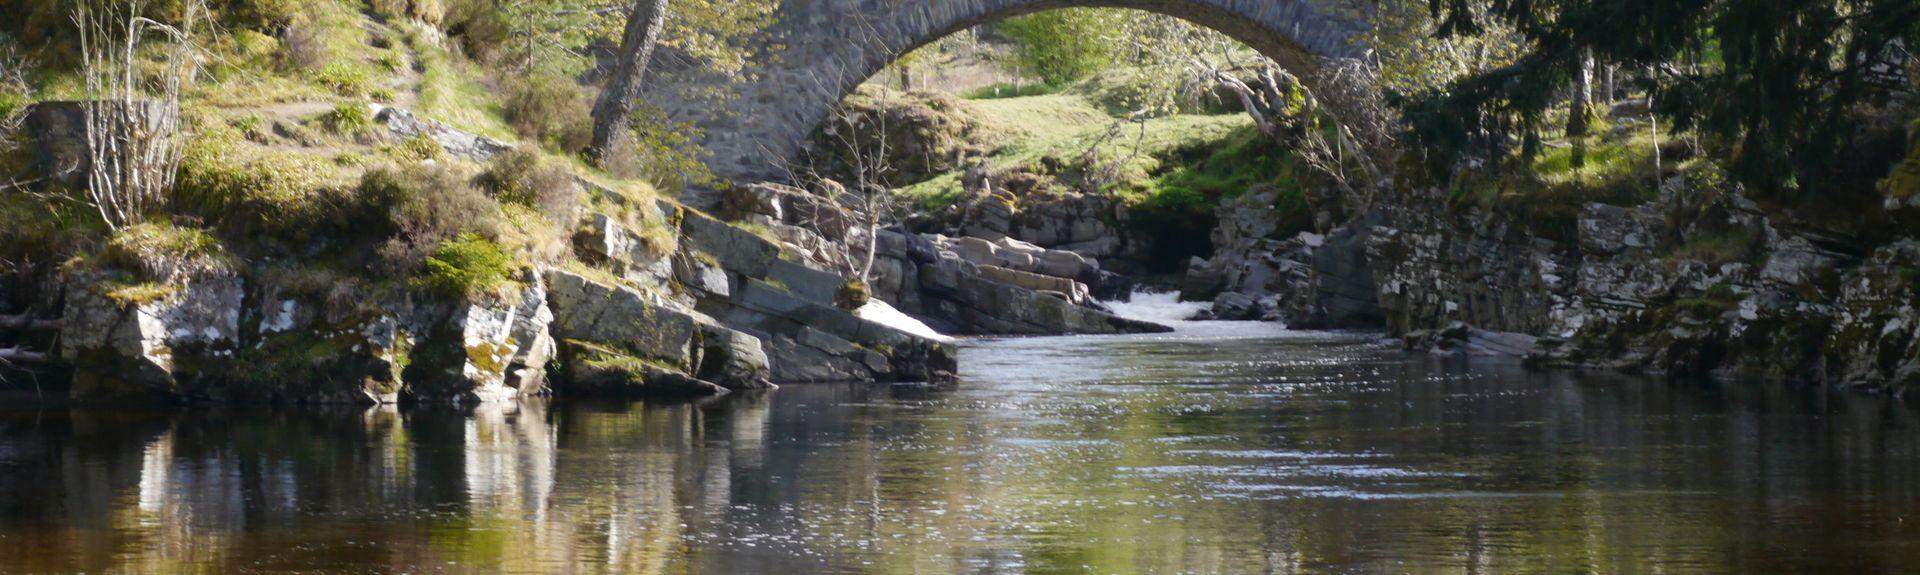 Speyside Wildlife, Aviemore, Schottland, Großbritannien